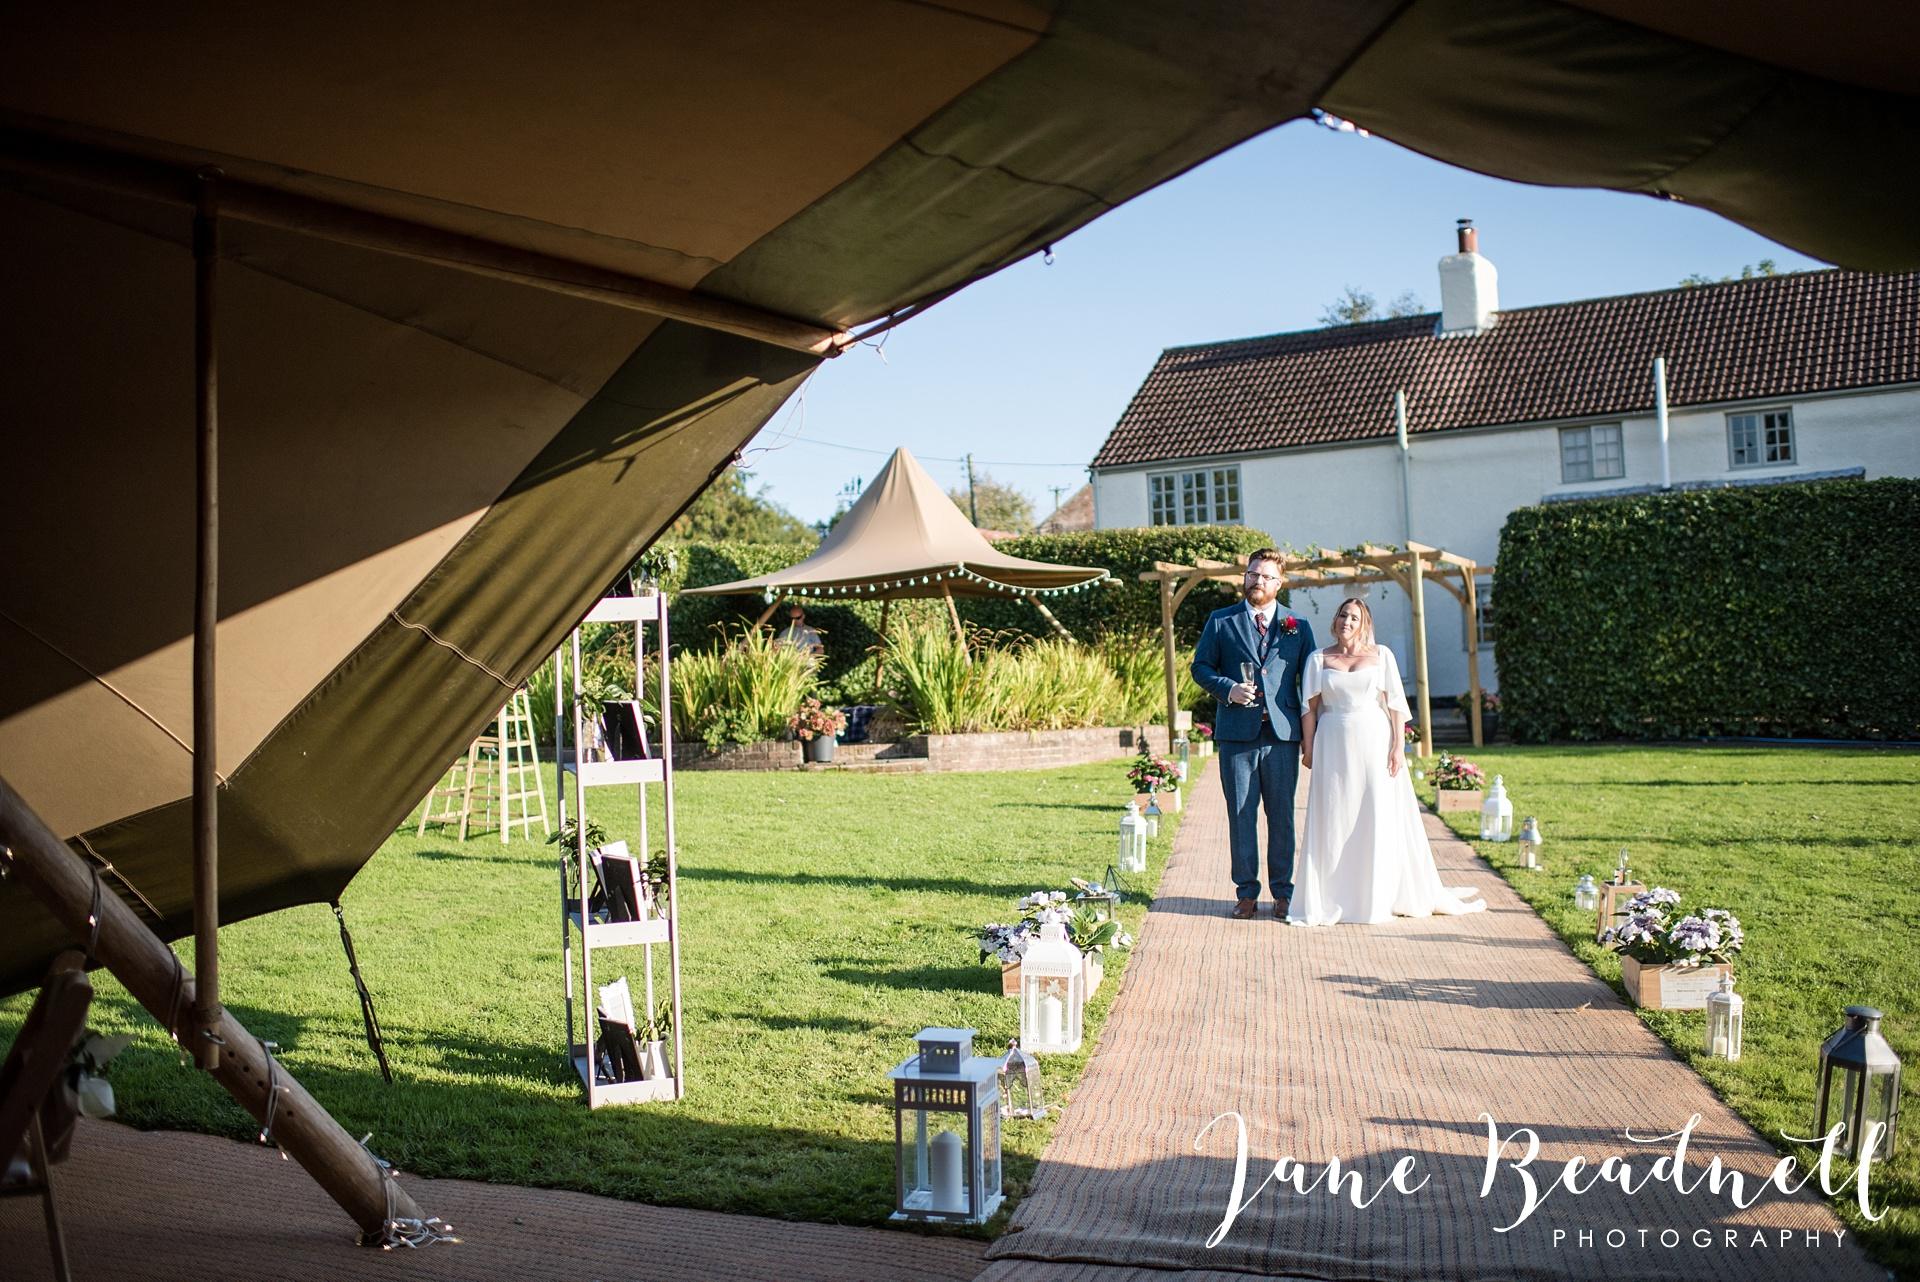 fine-art-wedding-photographer-jane-beadnell-yorkshire-wedding-photographer-garden-wedding_0121